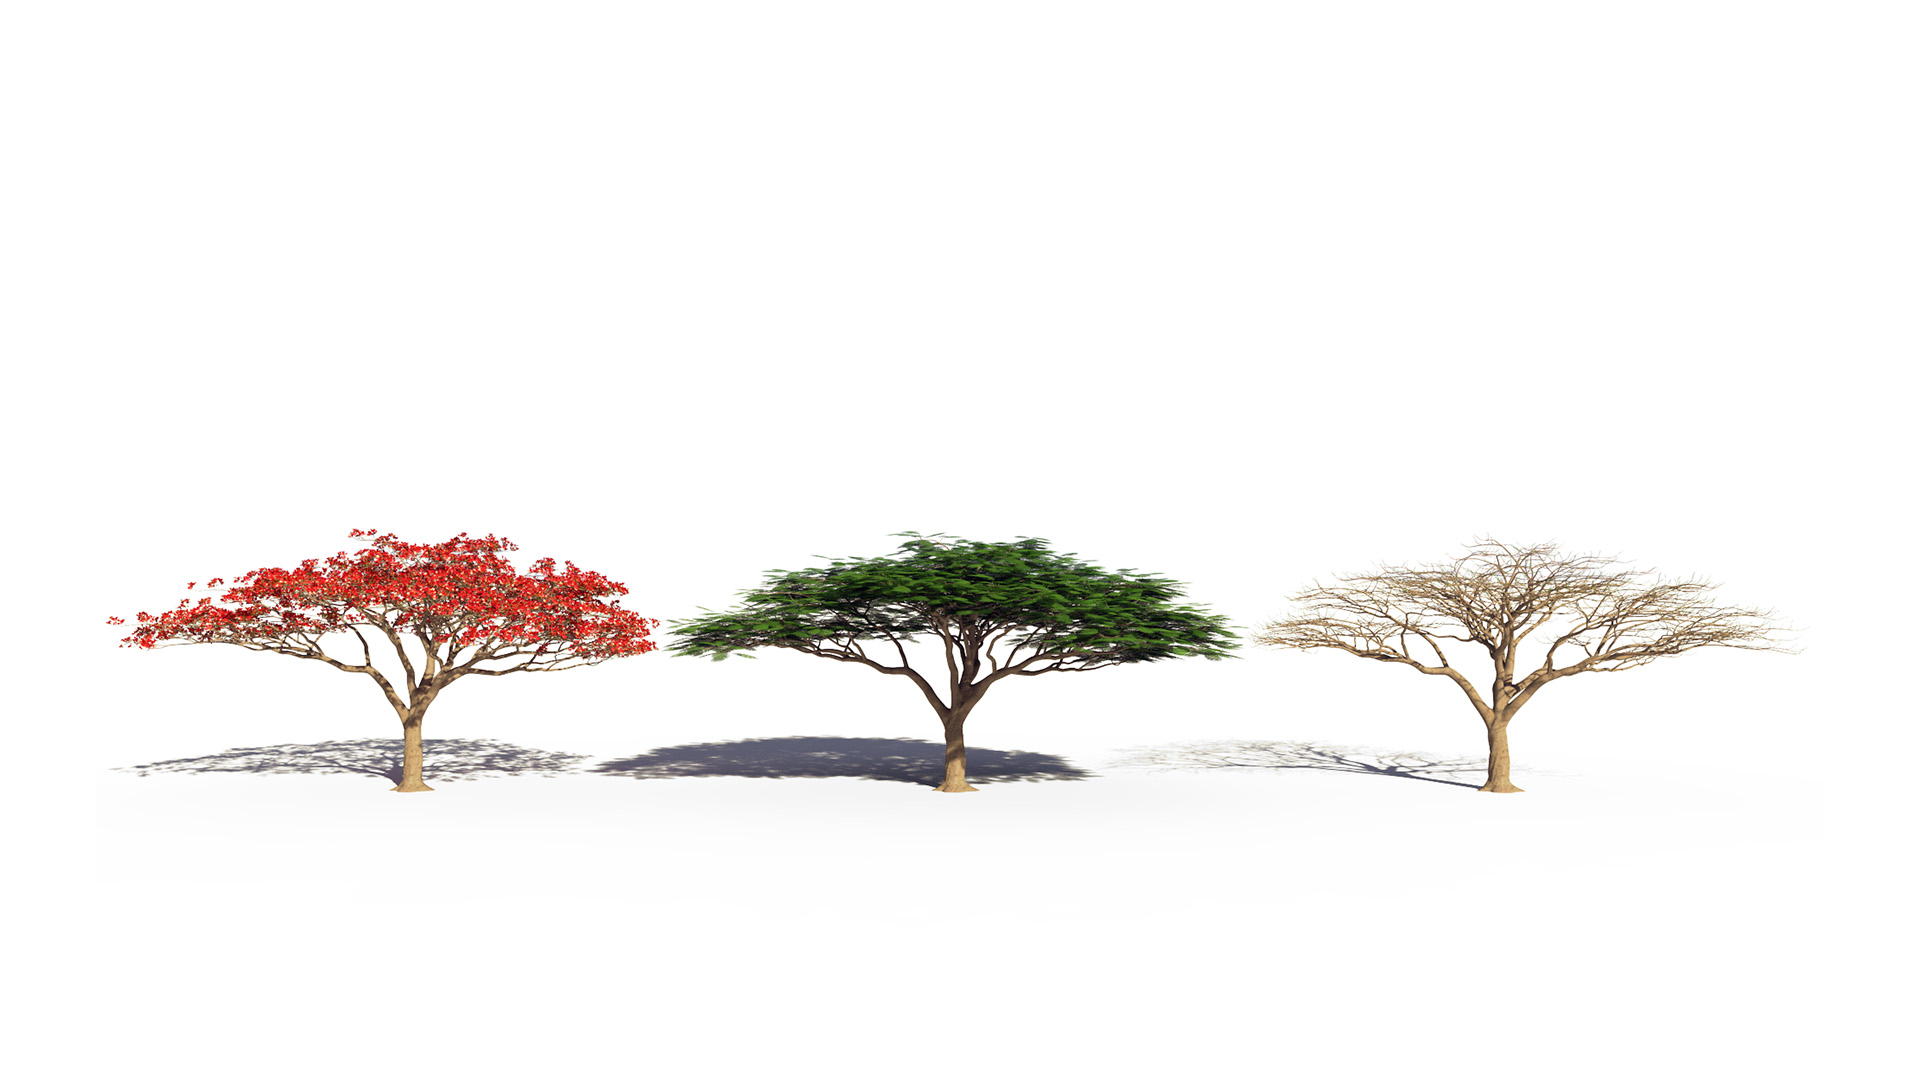 3D model of the Royal poinciana Delonix regia season variations